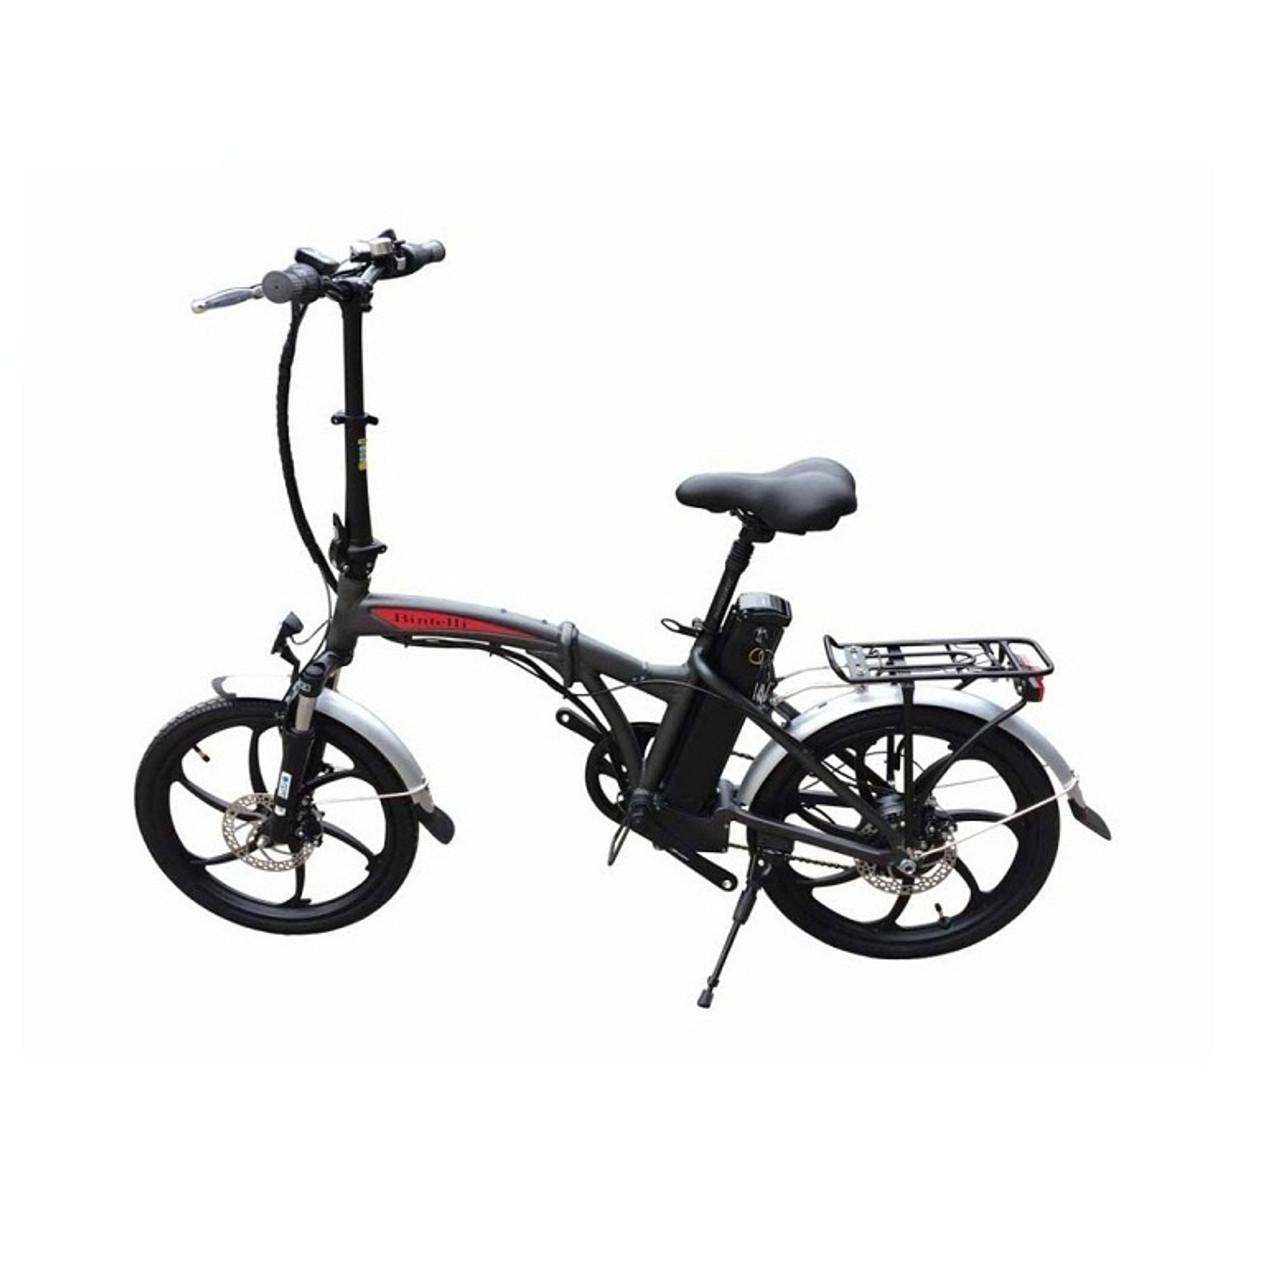 Bintelli F1 Folding Electric Bicycle, 250 Watt Motor